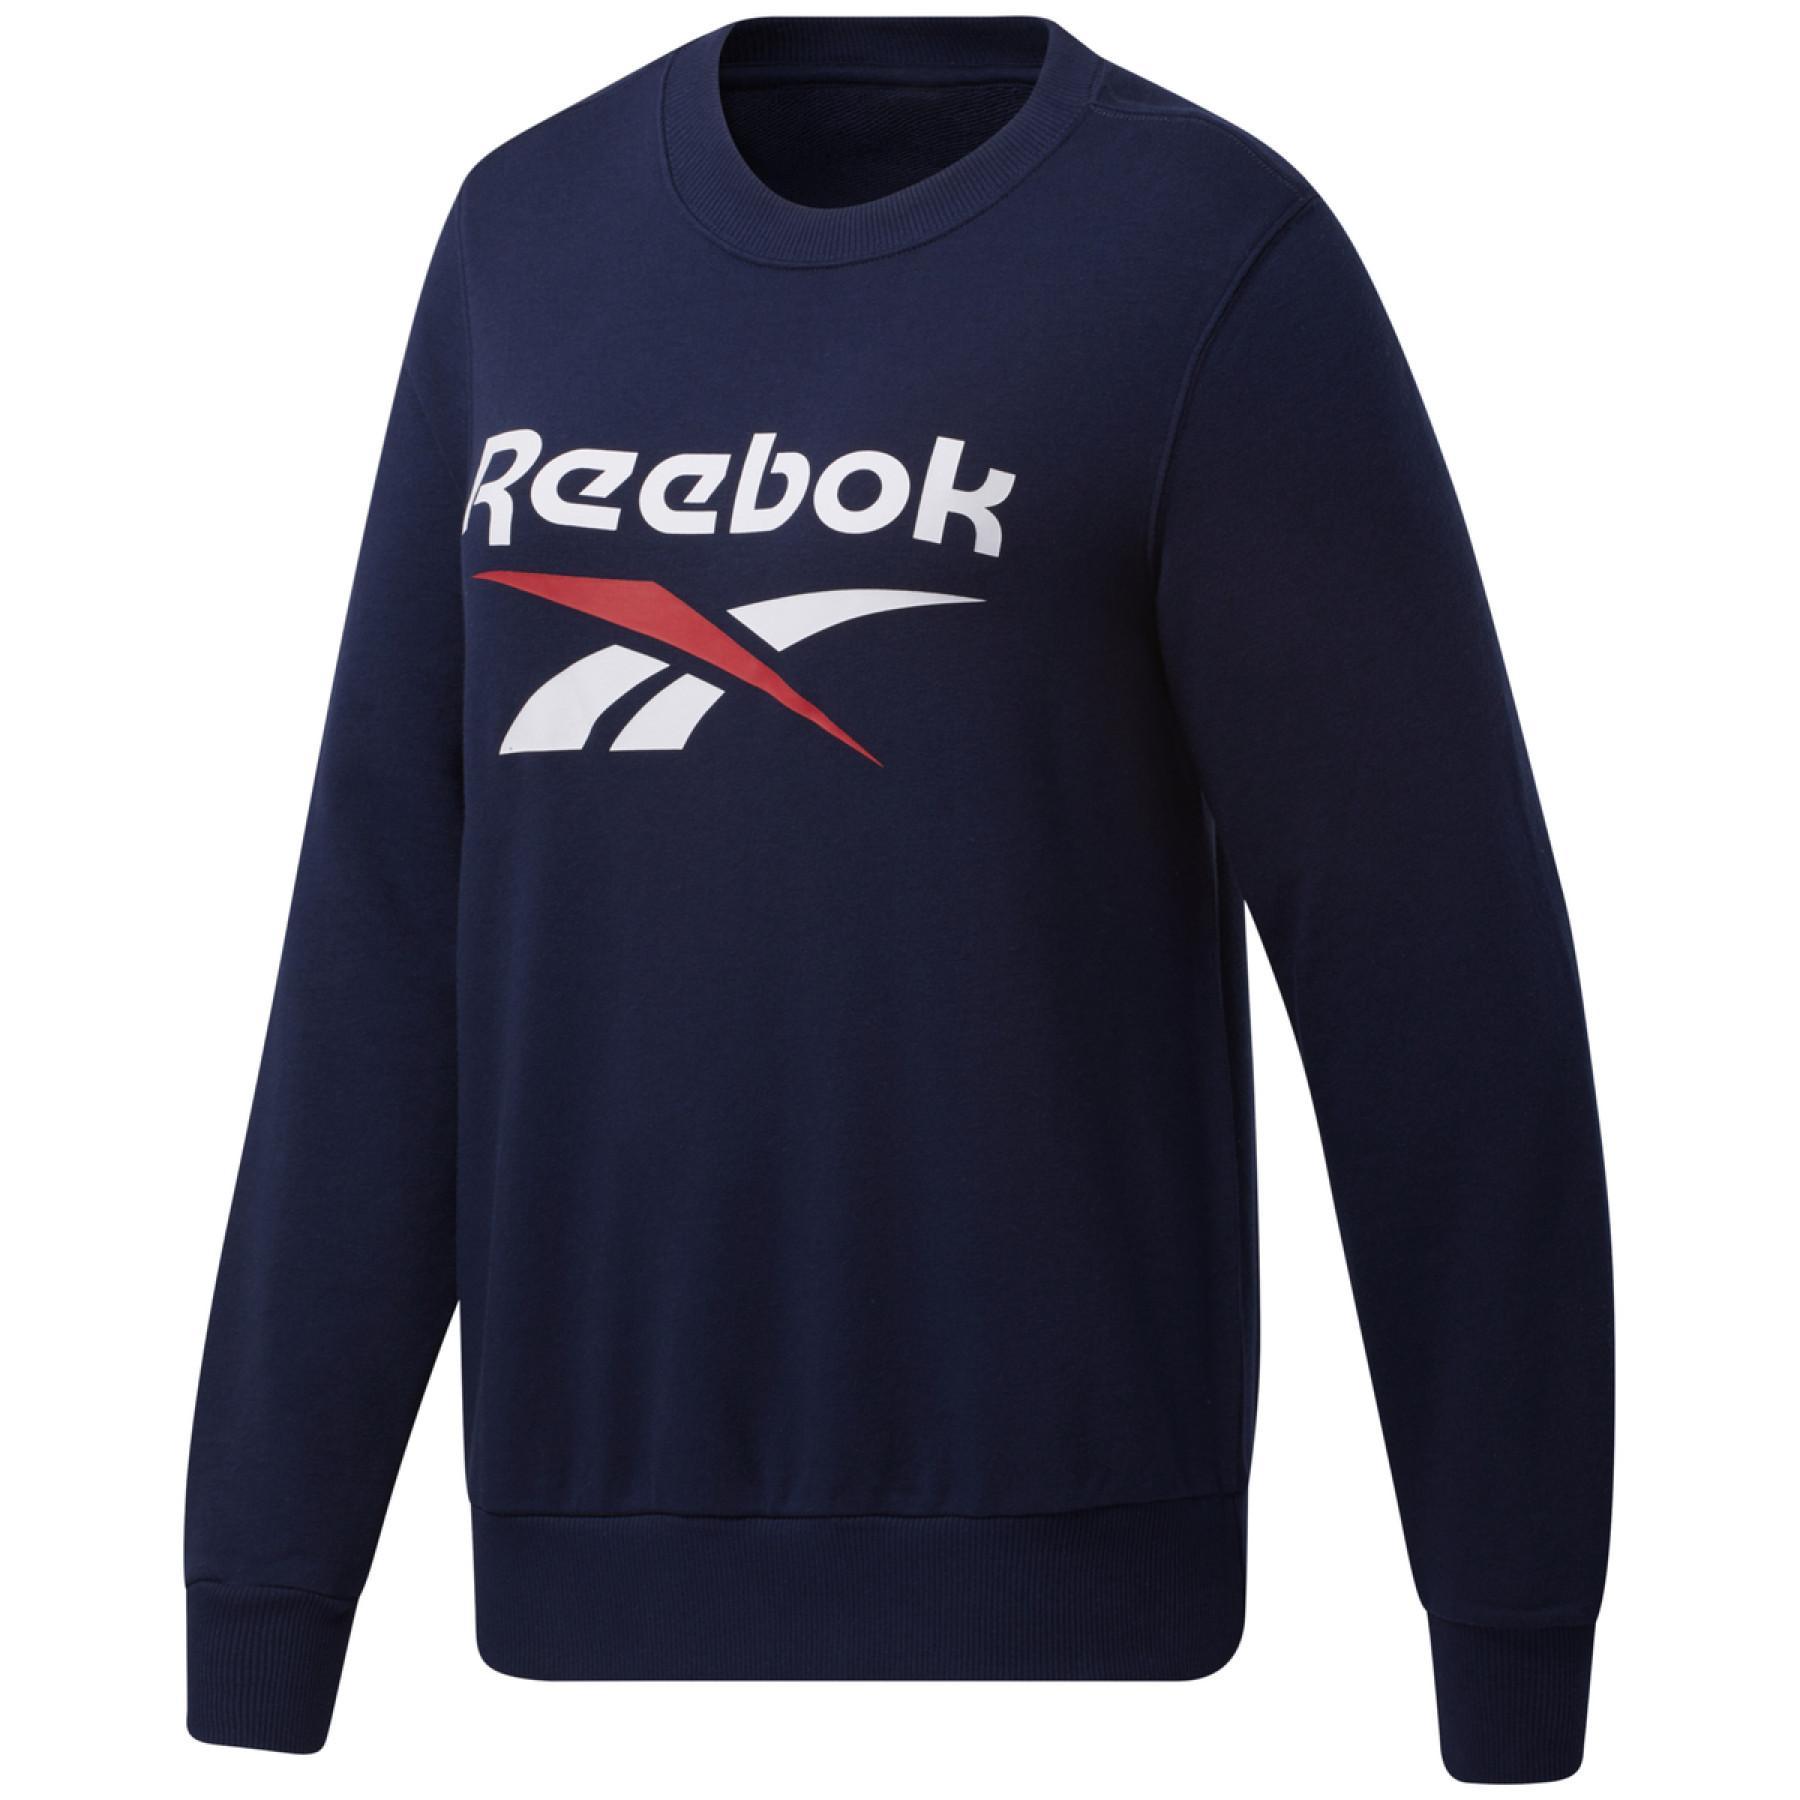 Sweatshirt femme Reebok Identity Logo French Terry